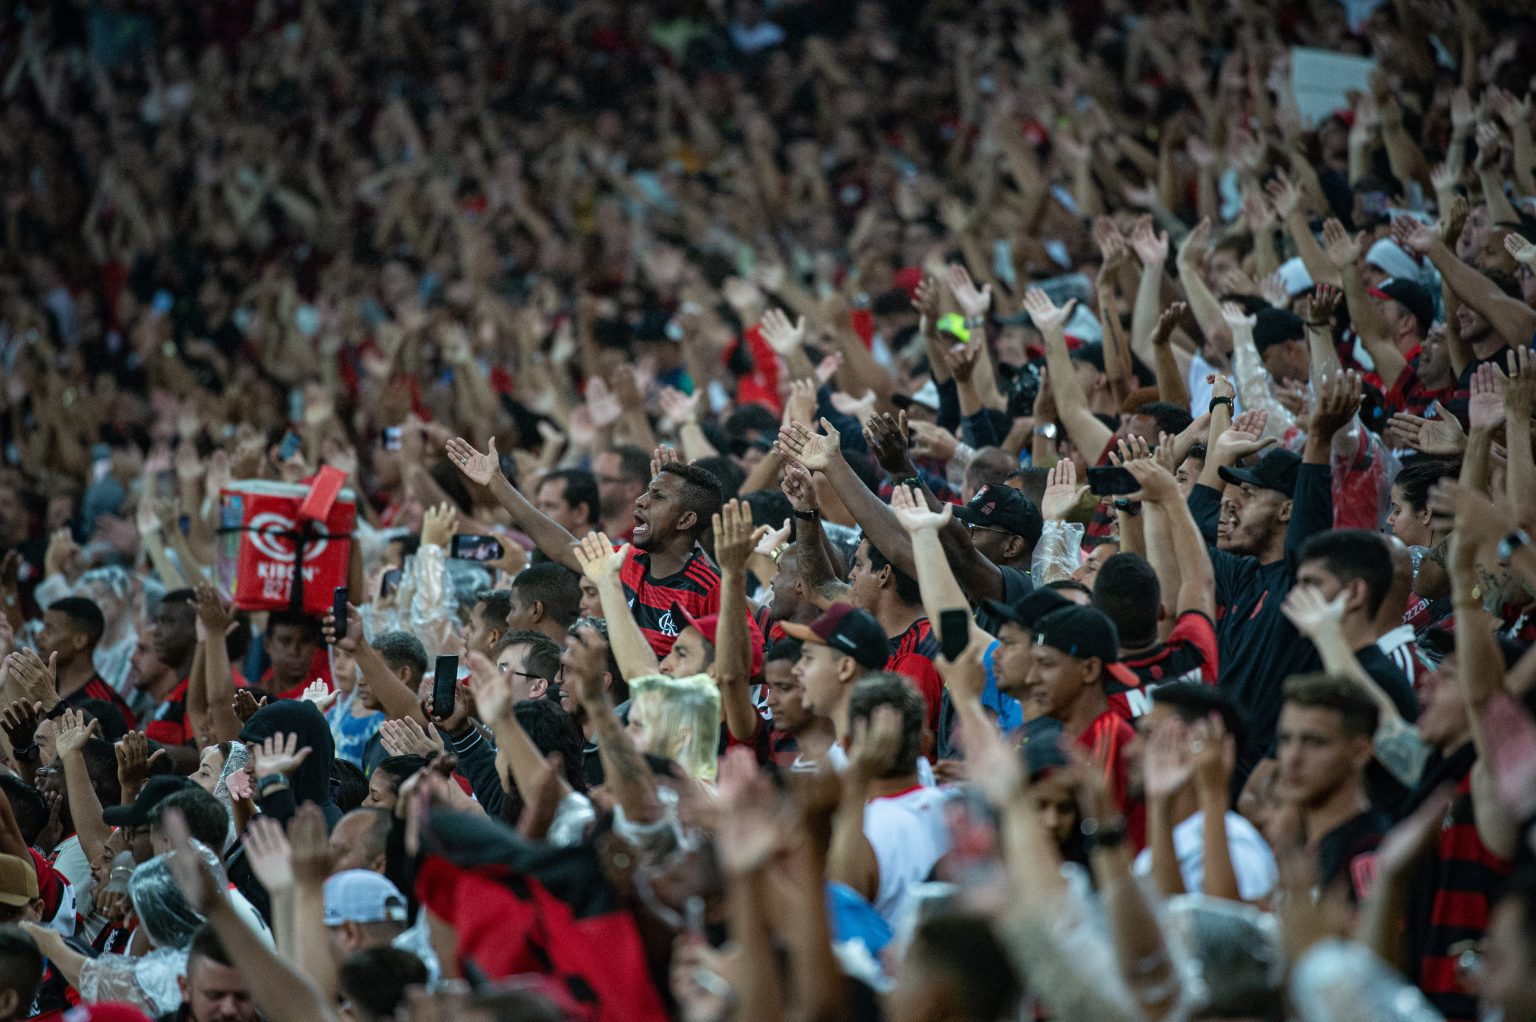 46 mil ingressos vendidos para a final da Taça Guanabara